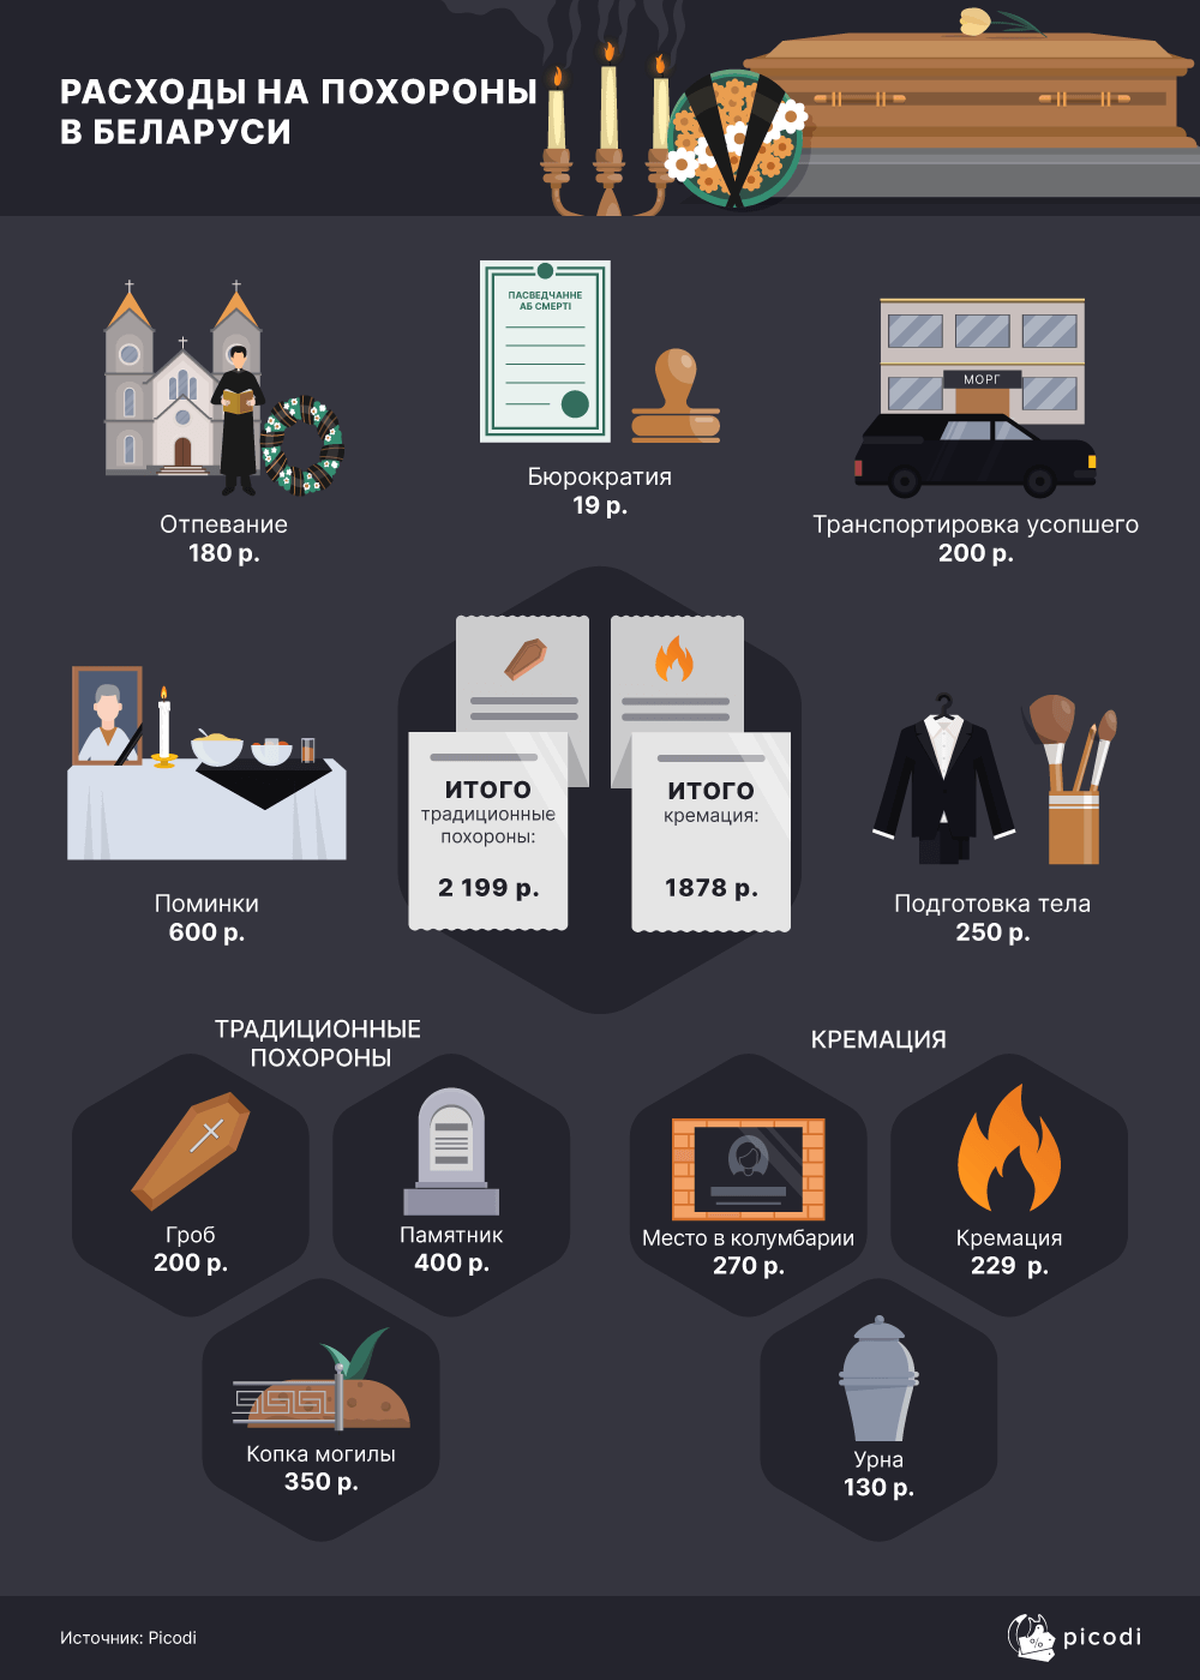 Инфографика: picodi.com